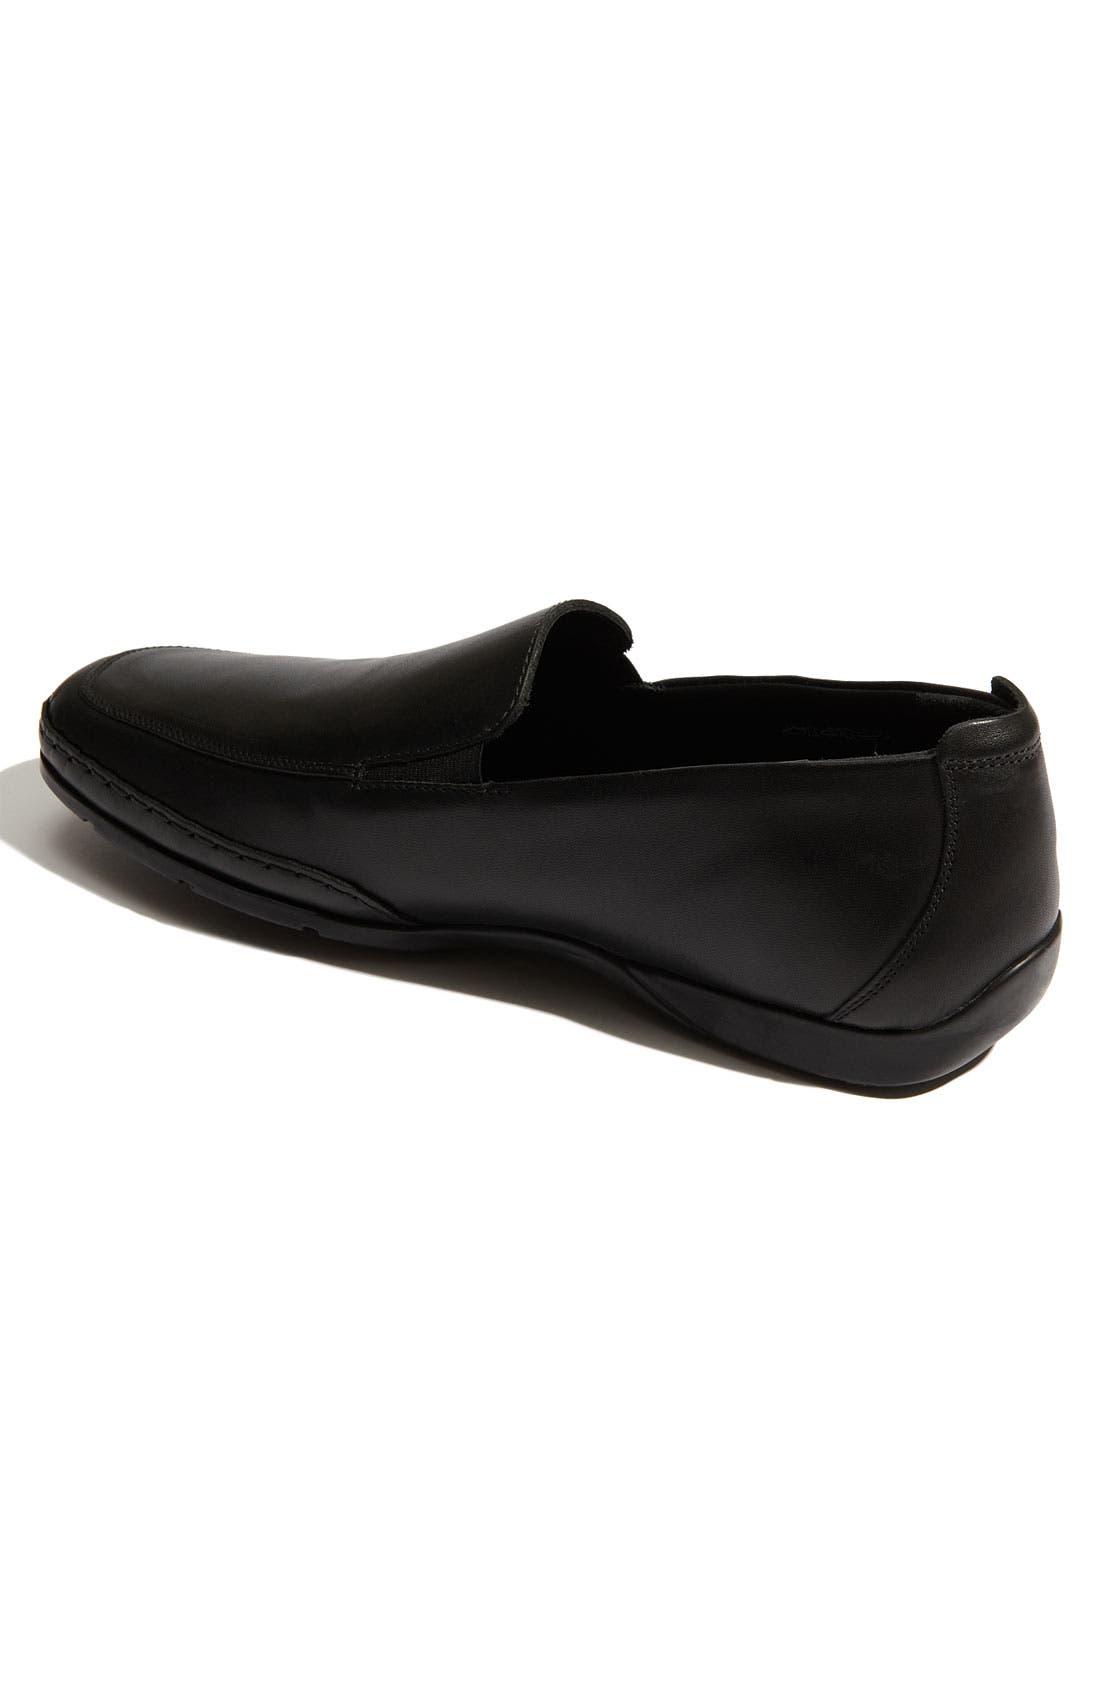 'Edlef' Slip-On,                             Alternate thumbnail 2, color,                             Black Smooth Leather